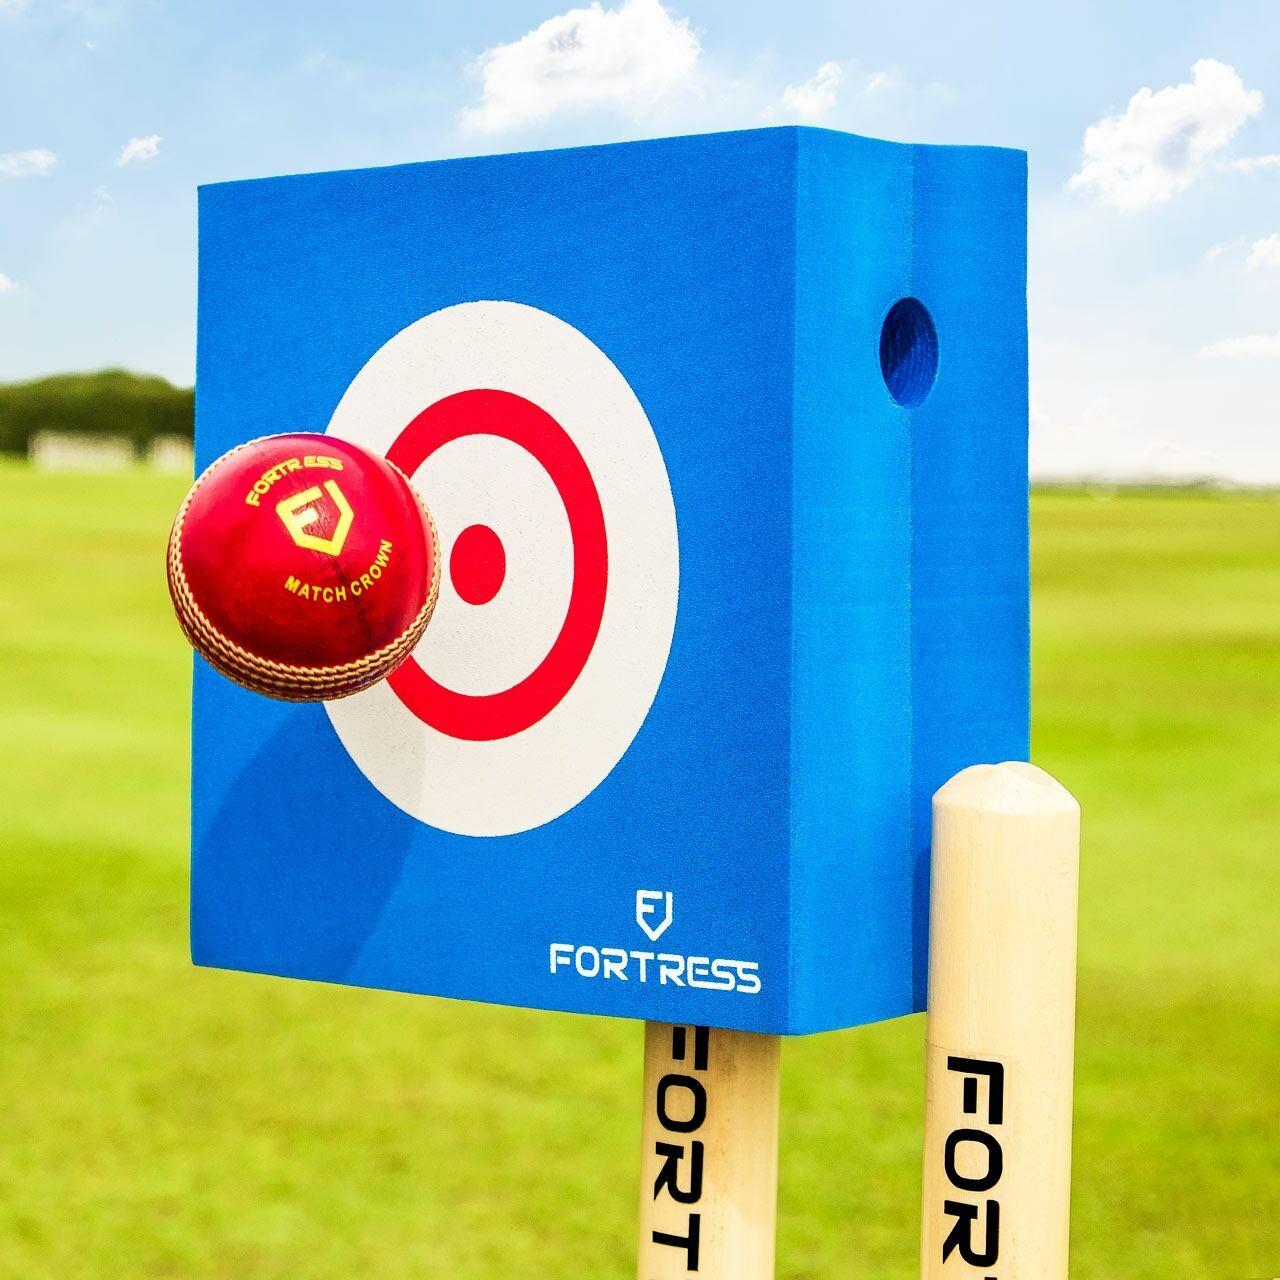 FORTRESS Foam Cricket Bowling Target